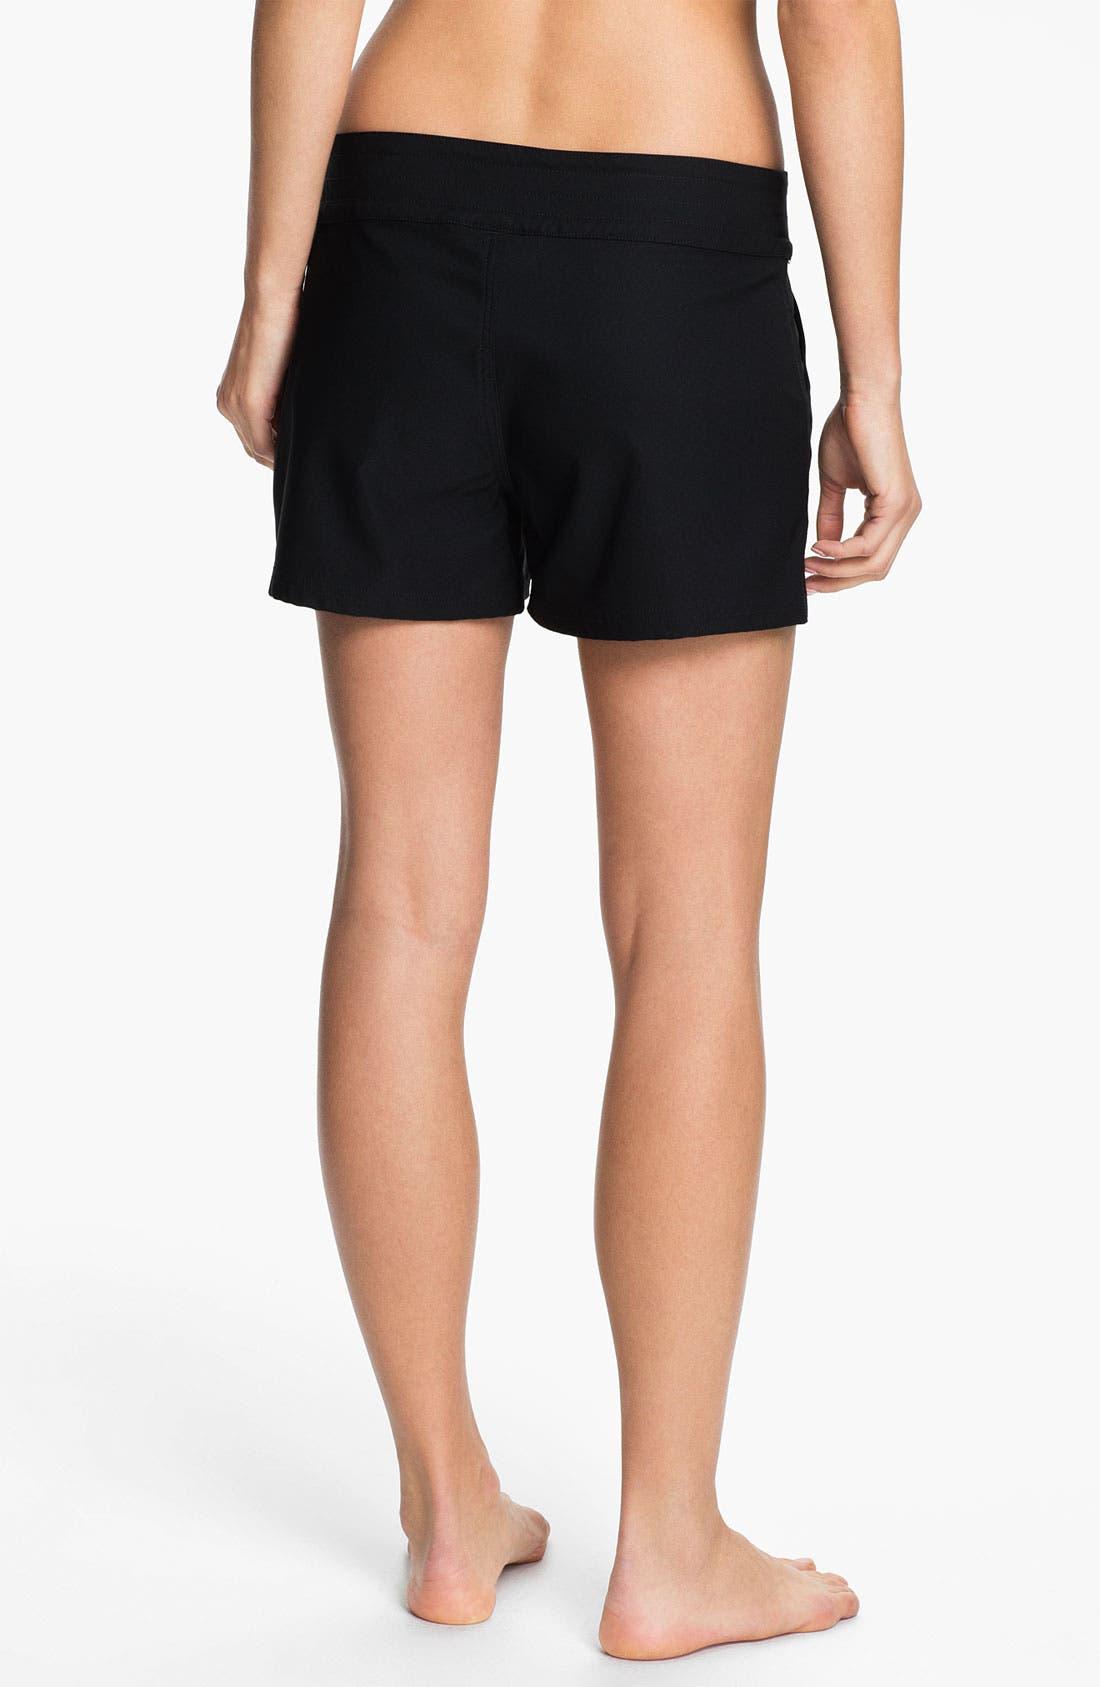 LA BLANCA, 'Boardwalk' Shorts, Alternate thumbnail 3, color, BLACK